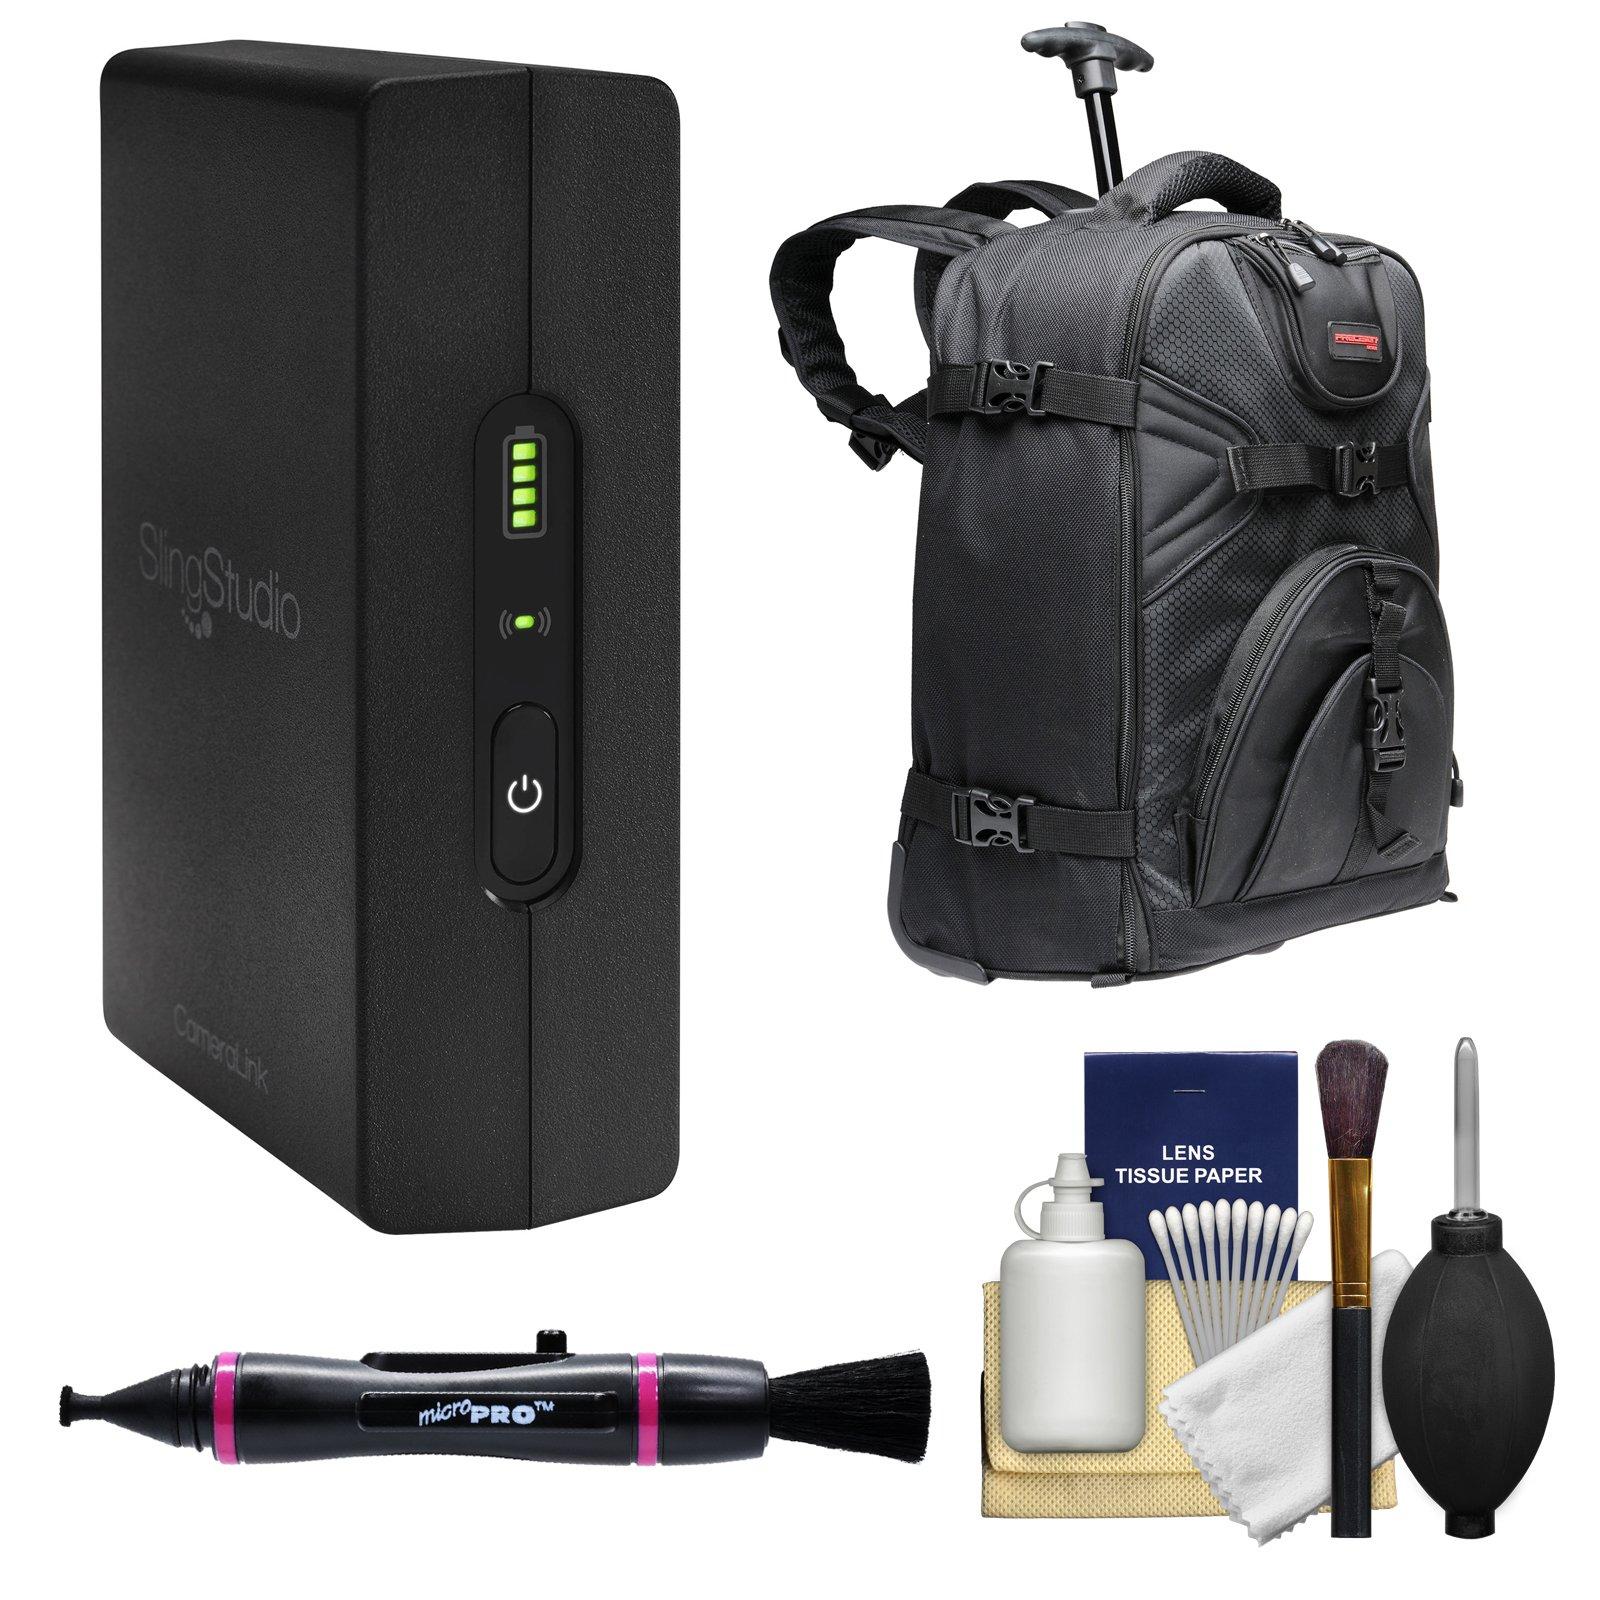 SlingStudio Wireless CameraLink with Backpack + Lenspen + Cleaning Kit by SlingStudio